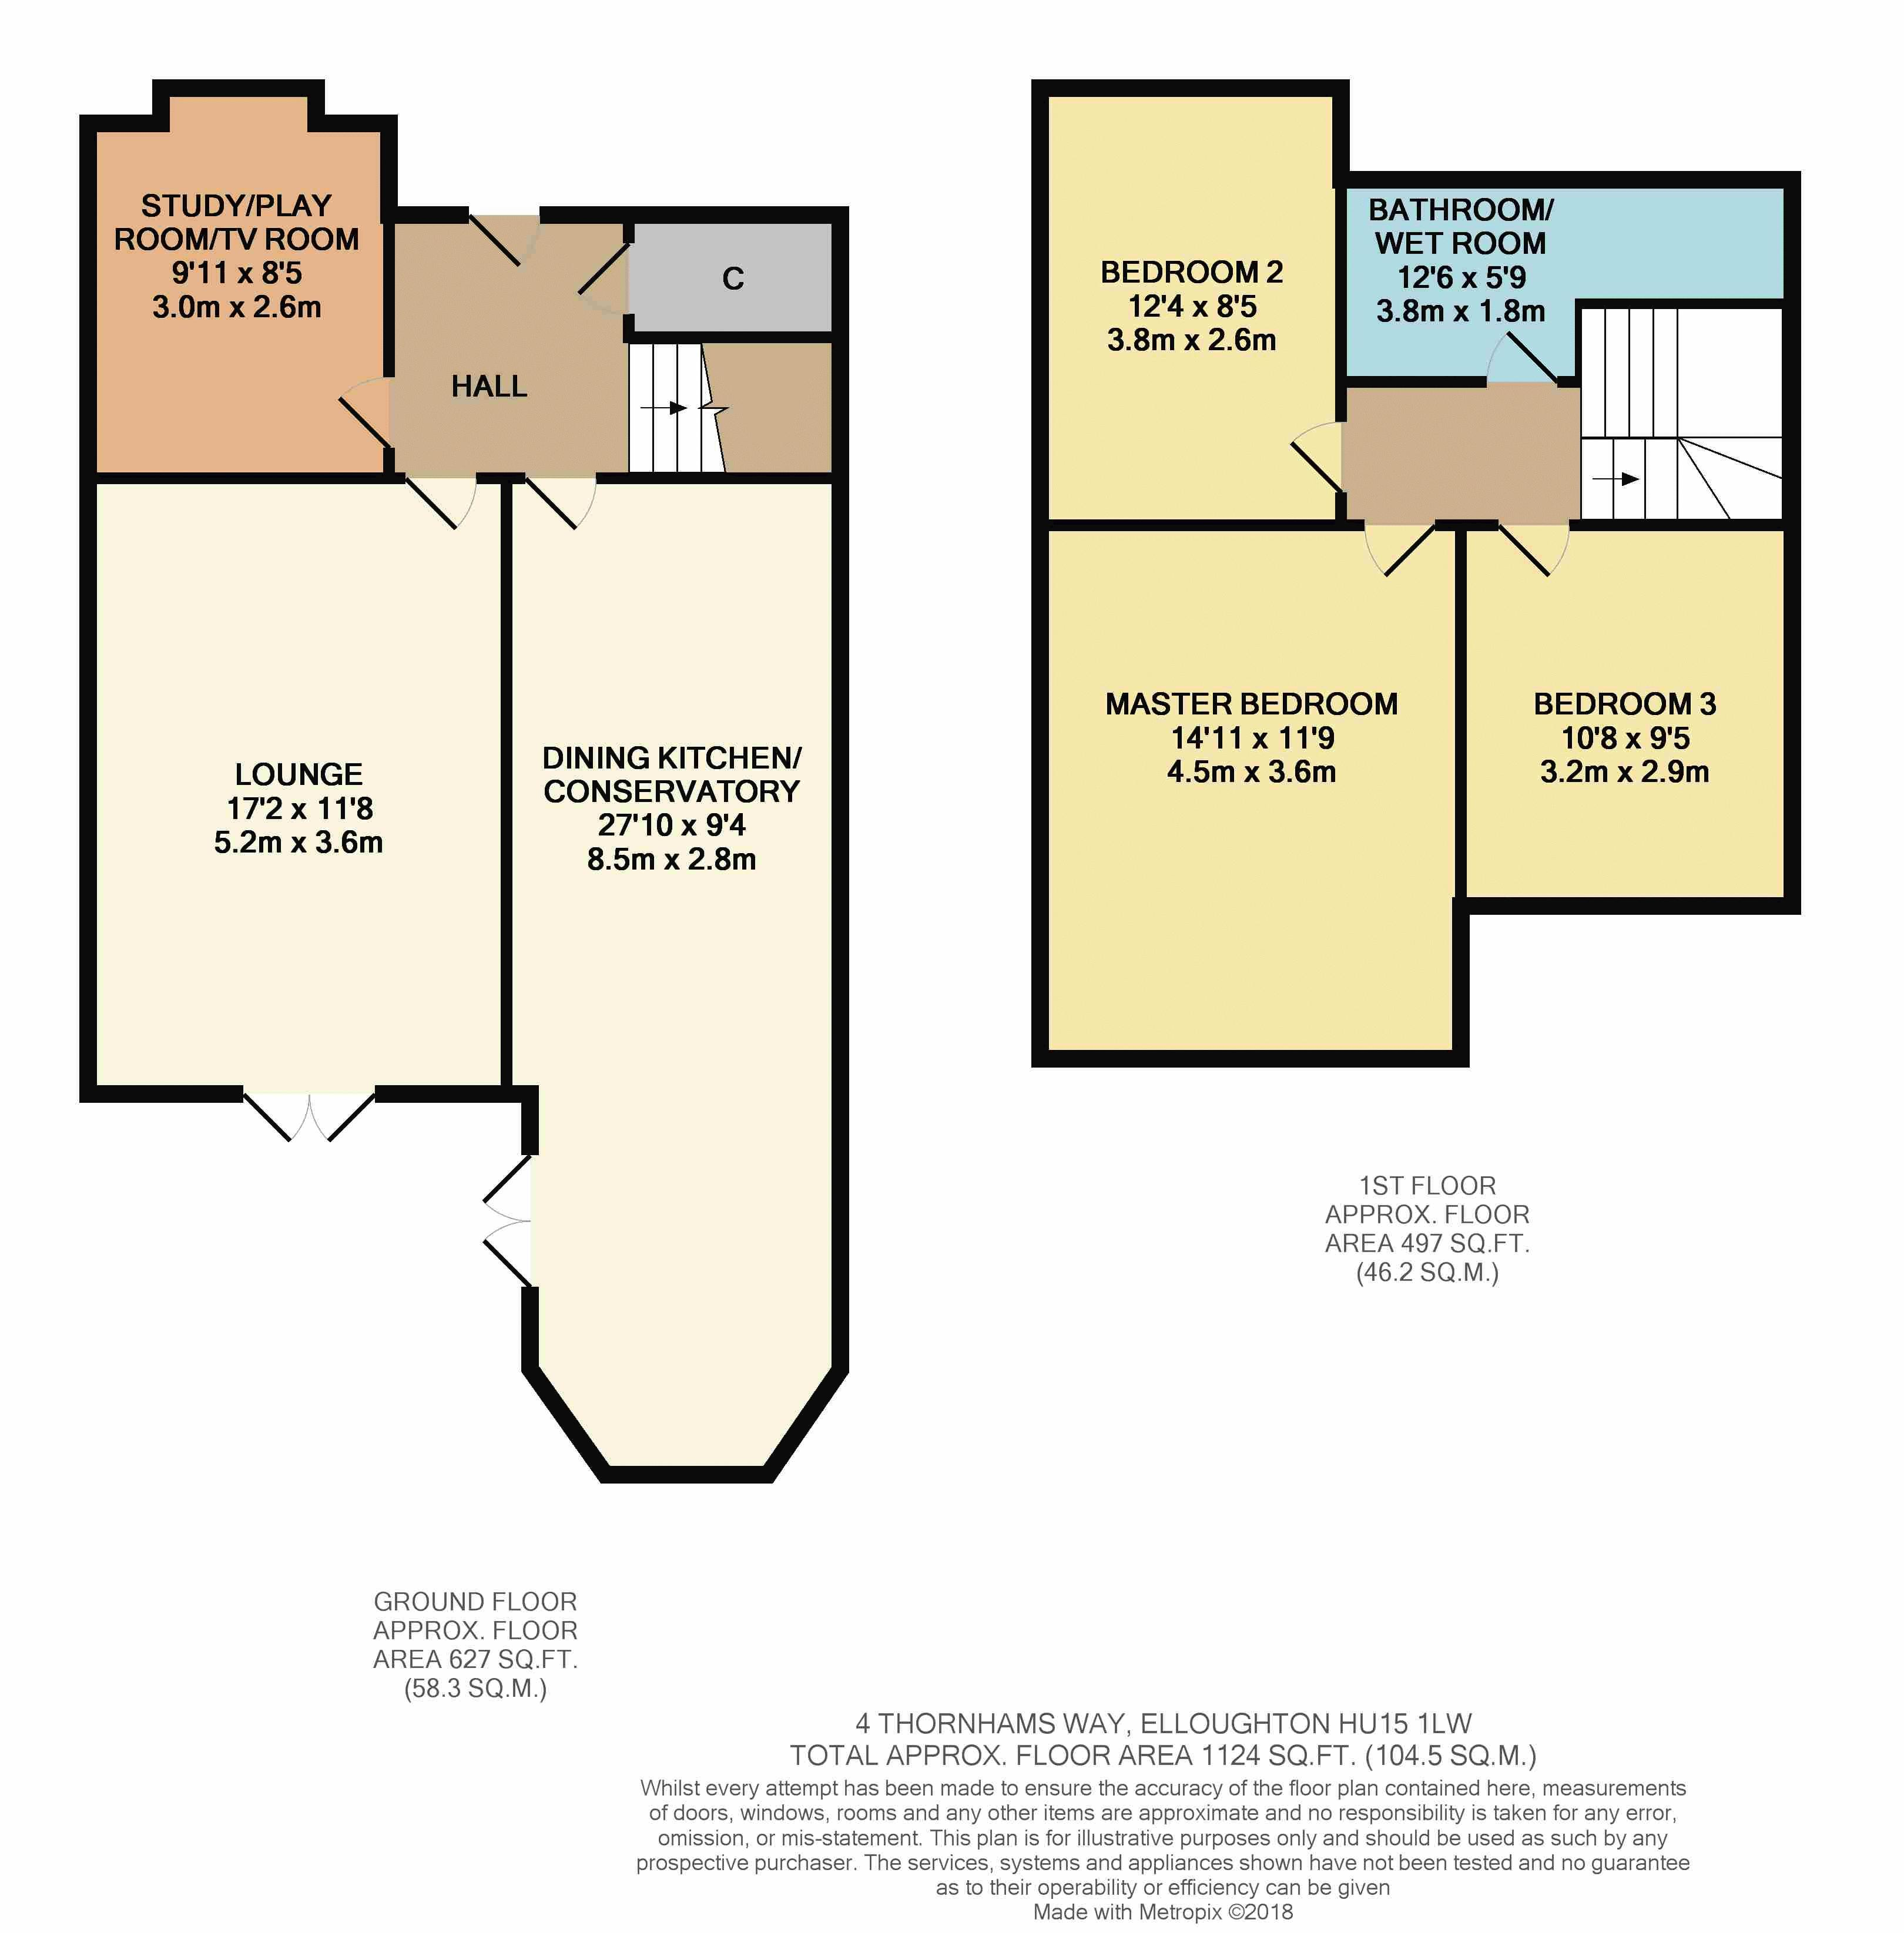 3 bedroom property in thornhams way elloughton 220 000